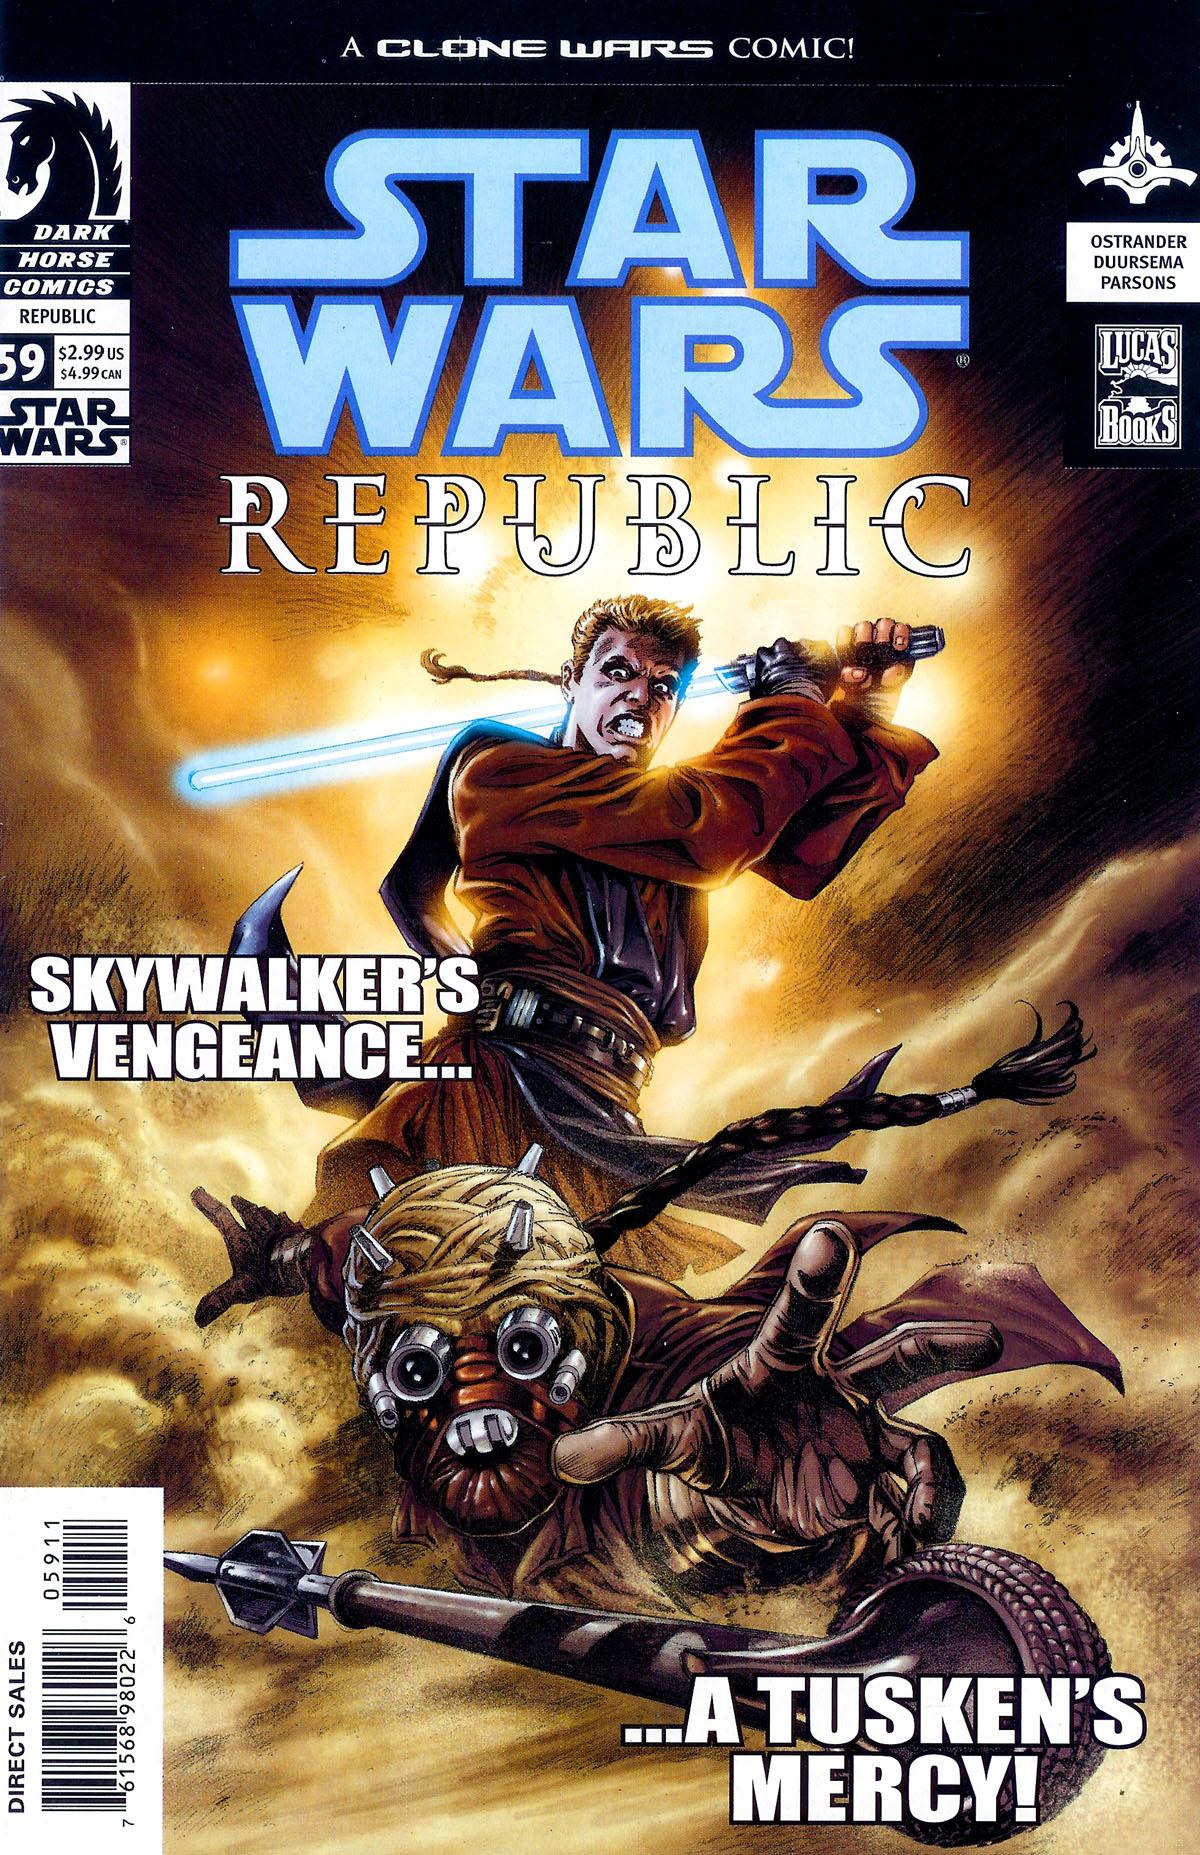 star wars republic 59 enemy lines wookieepedia the star wars wiki. Black Bedroom Furniture Sets. Home Design Ideas